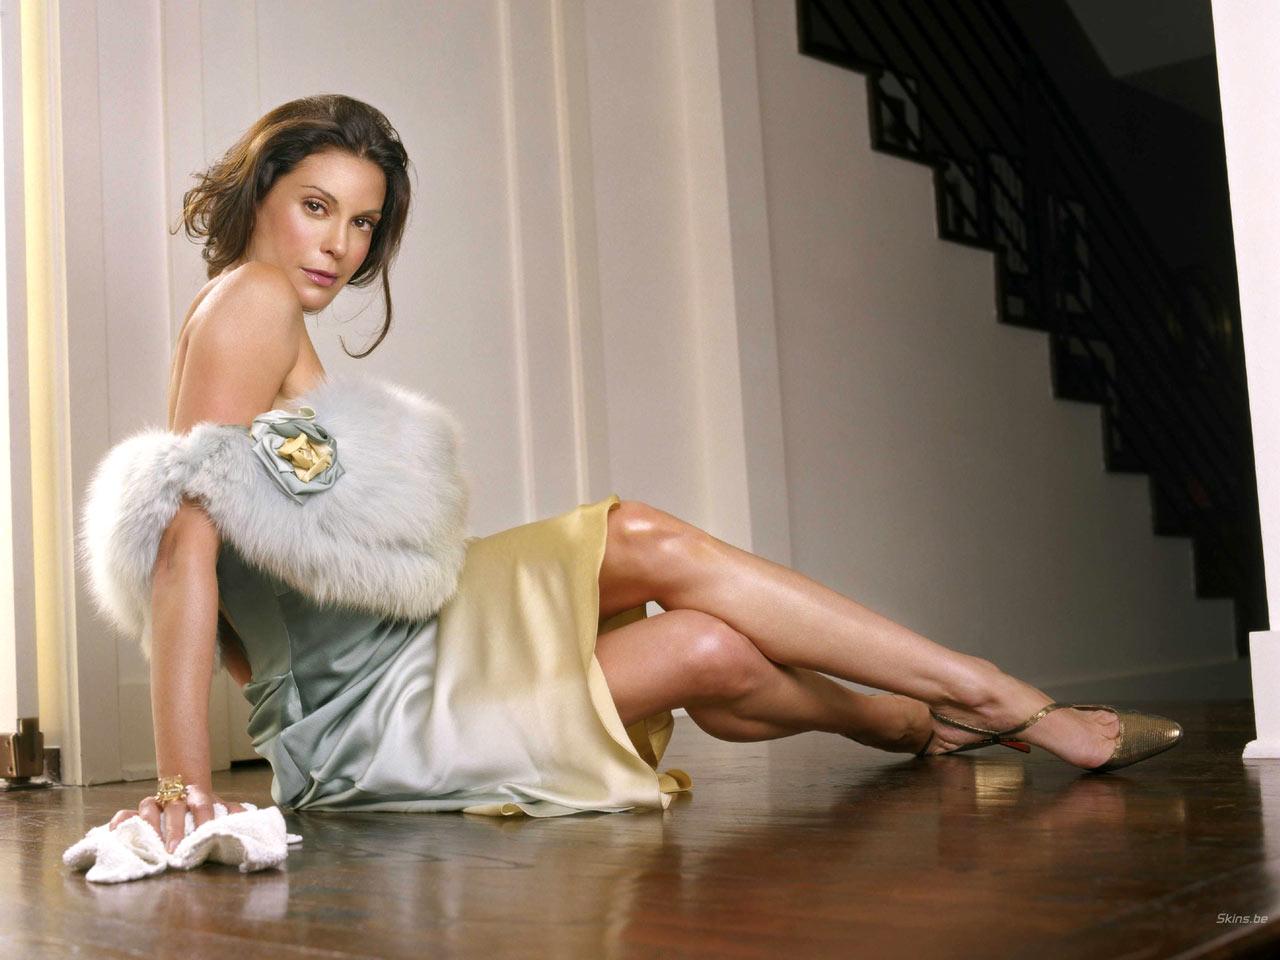 Hot Models  Teen Models  Actresses  Celebrities -8730